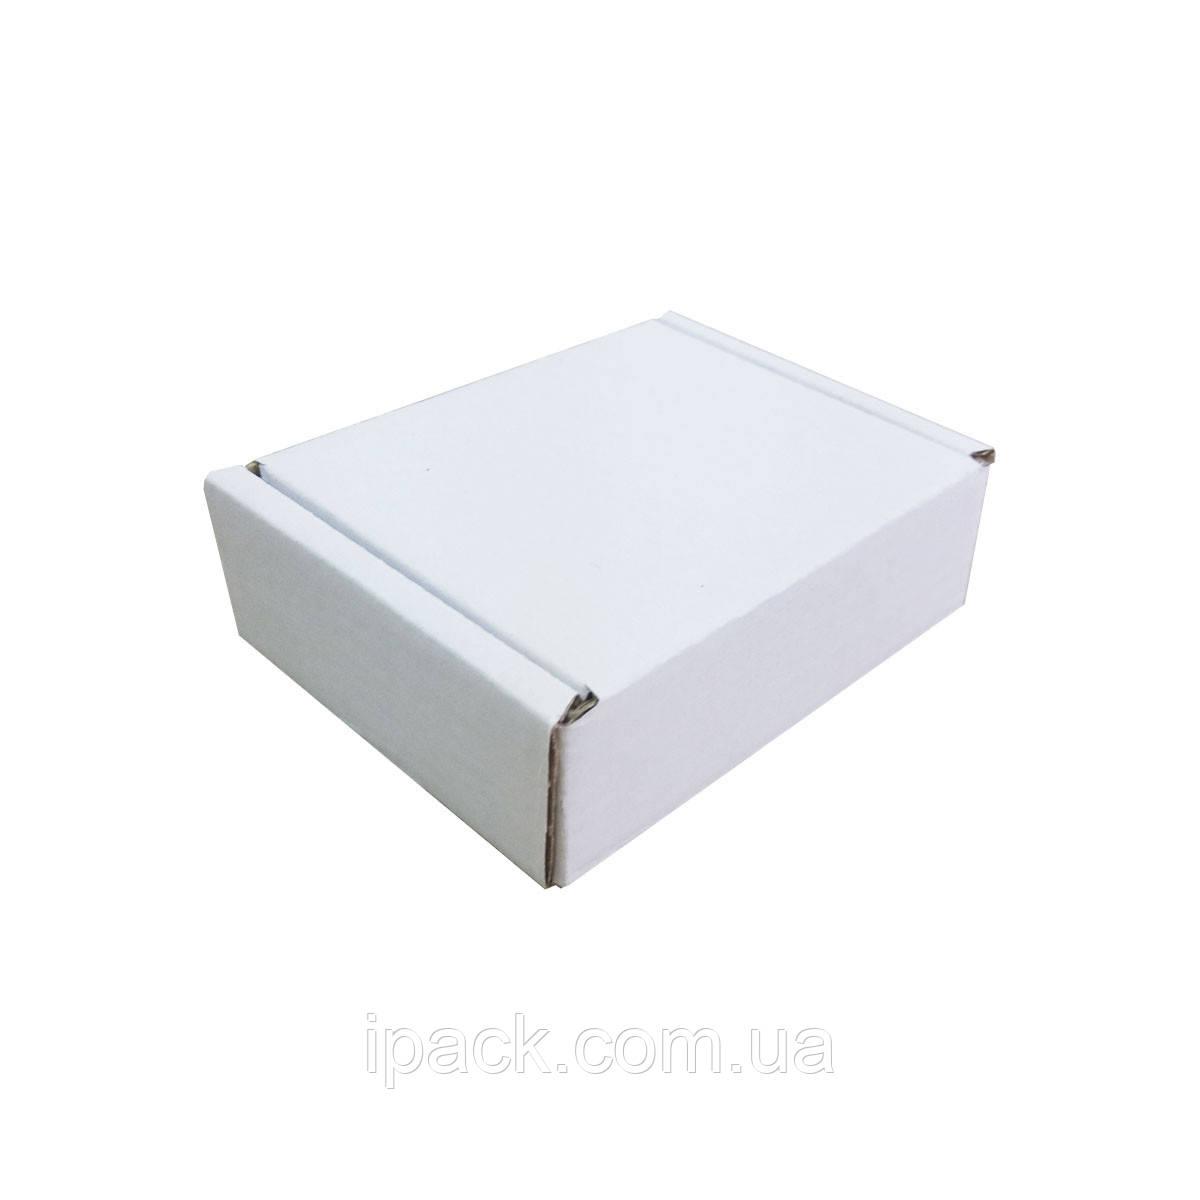 Коробка картонная самосборная 80*65*27 мм белая микрогофрокартон